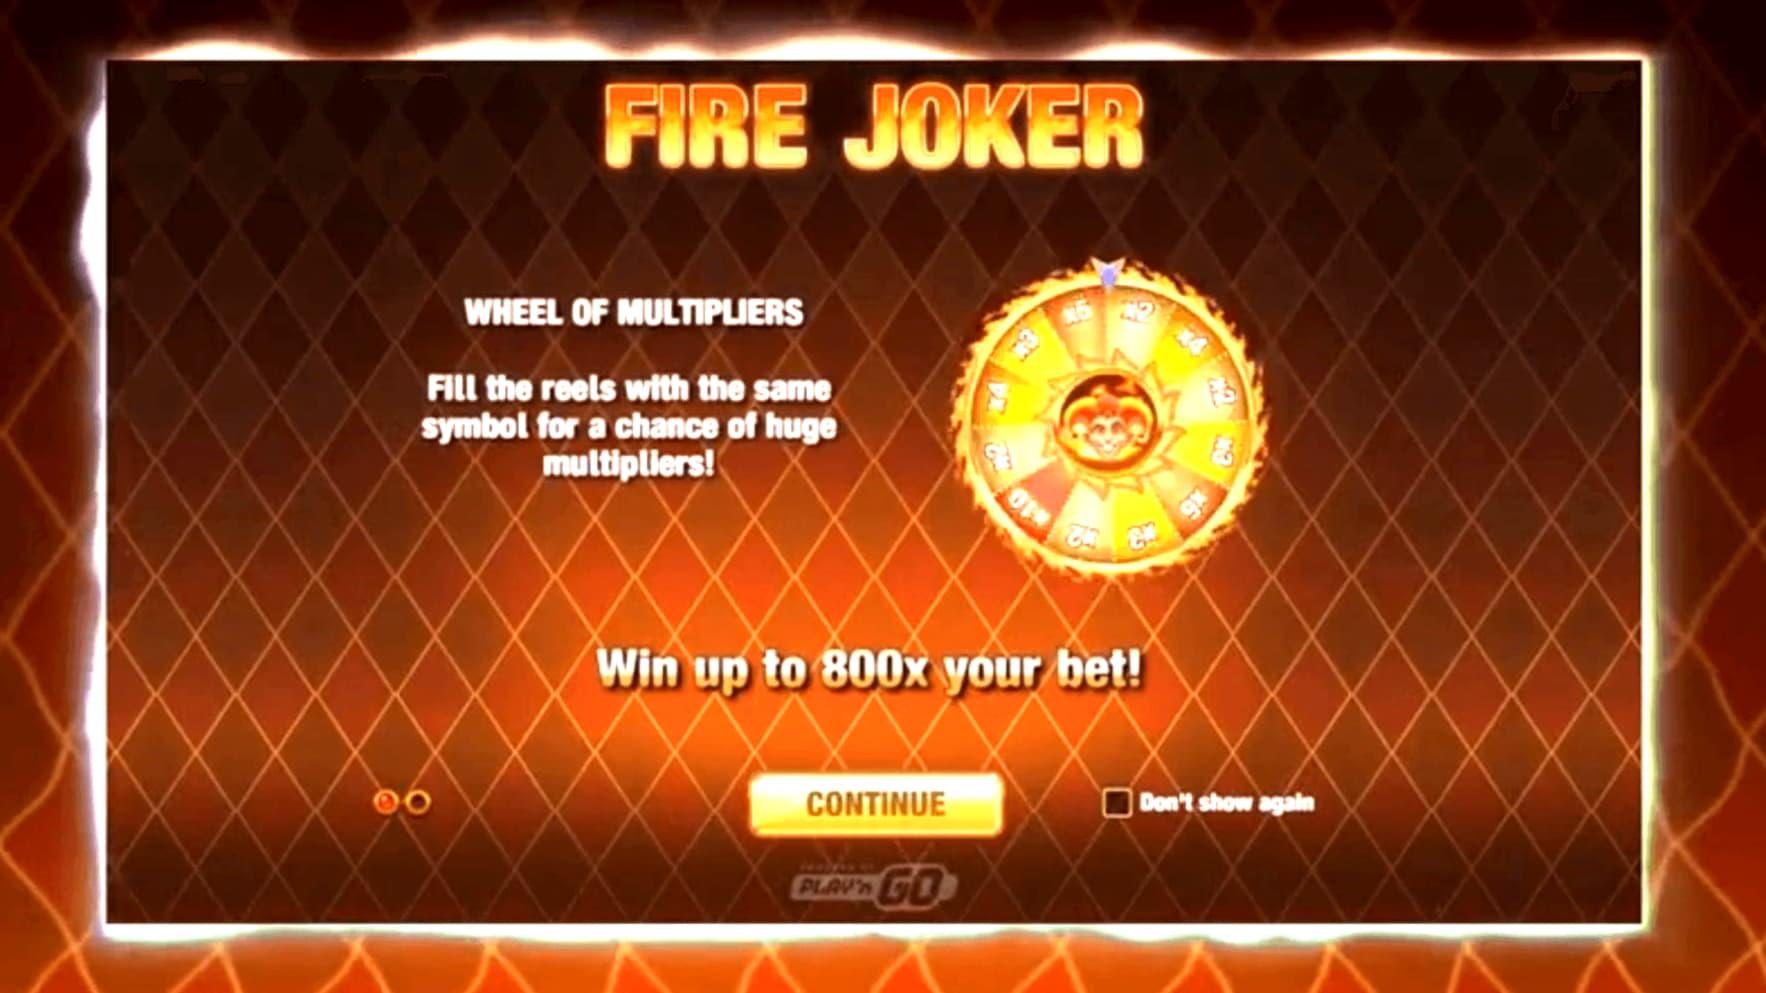 €110 Online Casino Tournament at 777 Casino